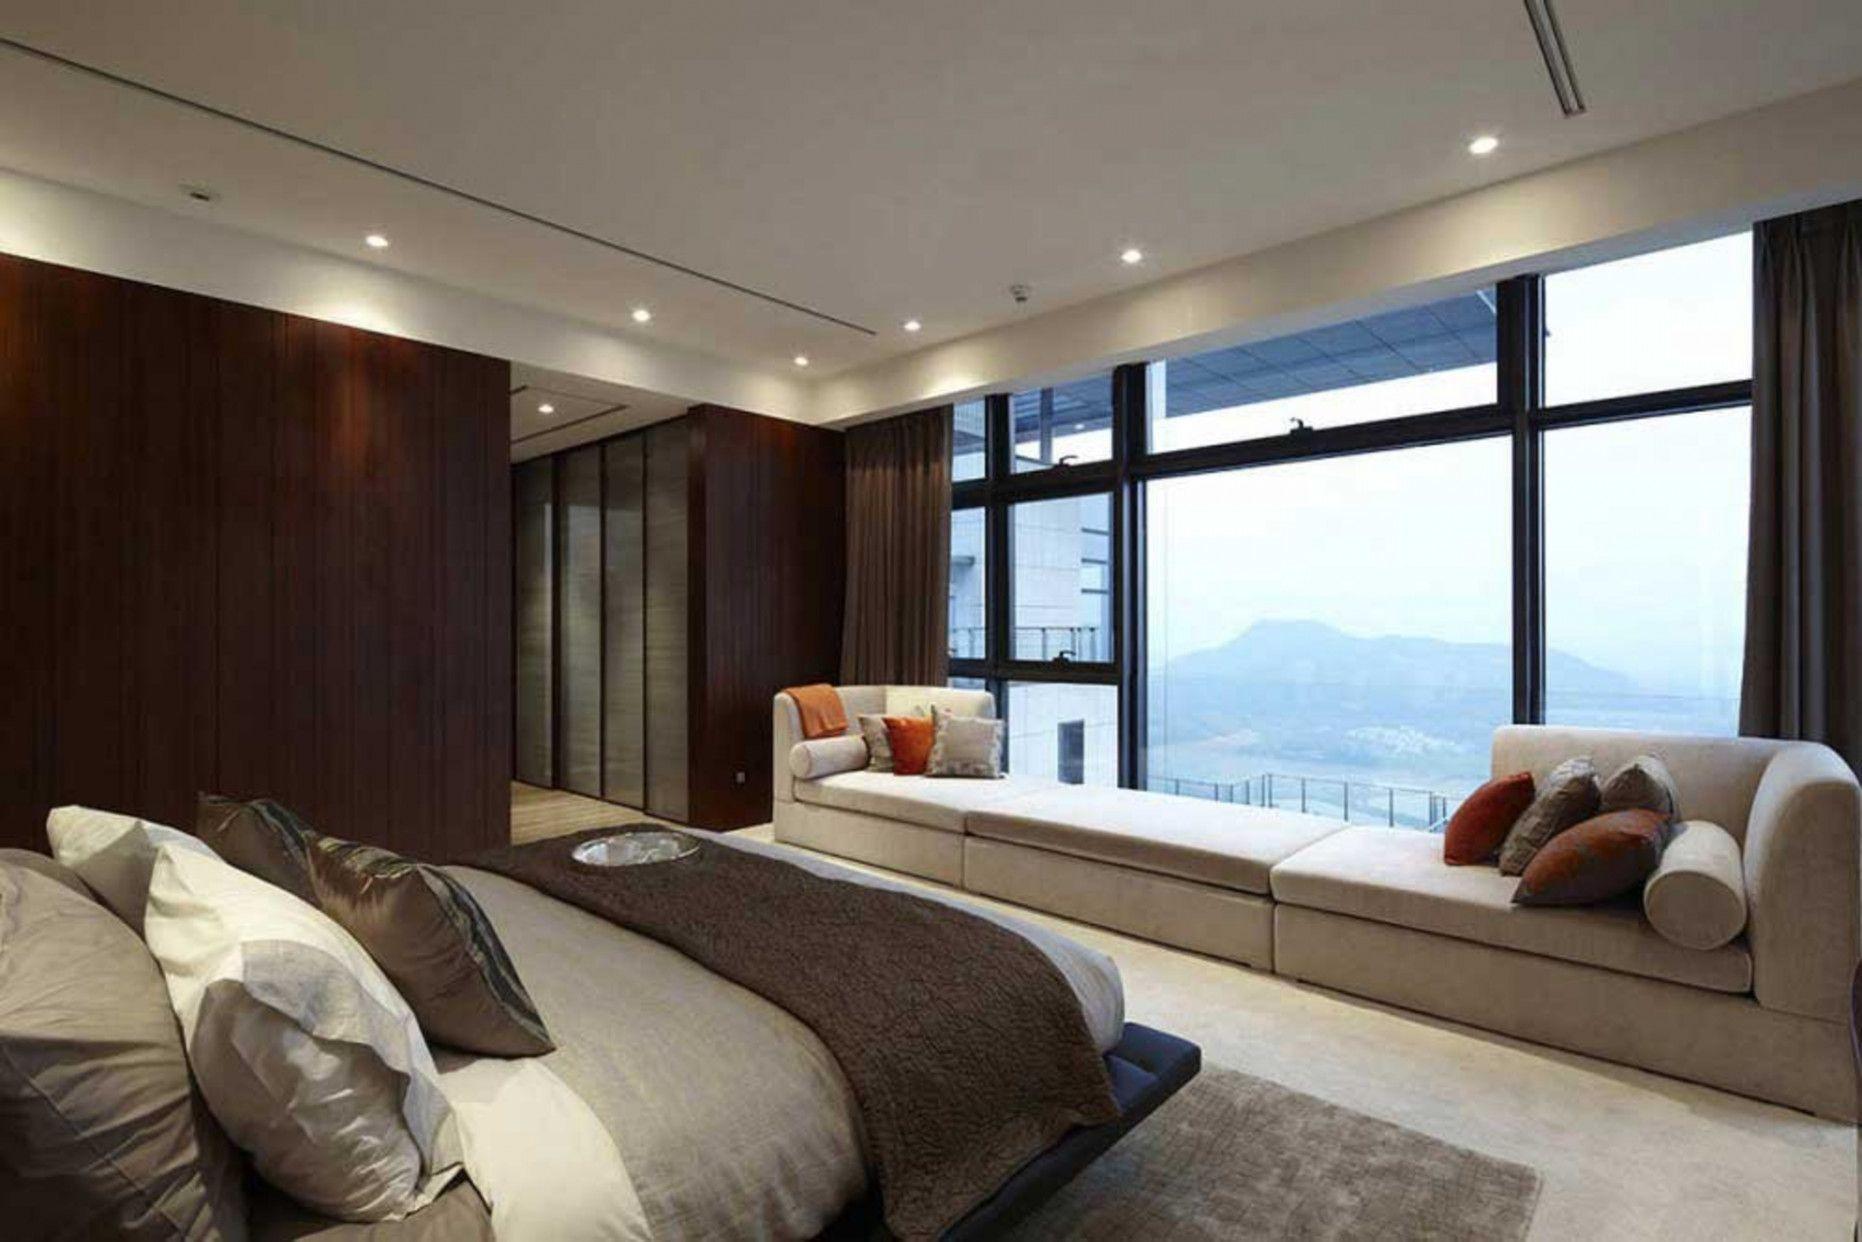 Best Luxury Bedrooms Interior Design Decor B2k